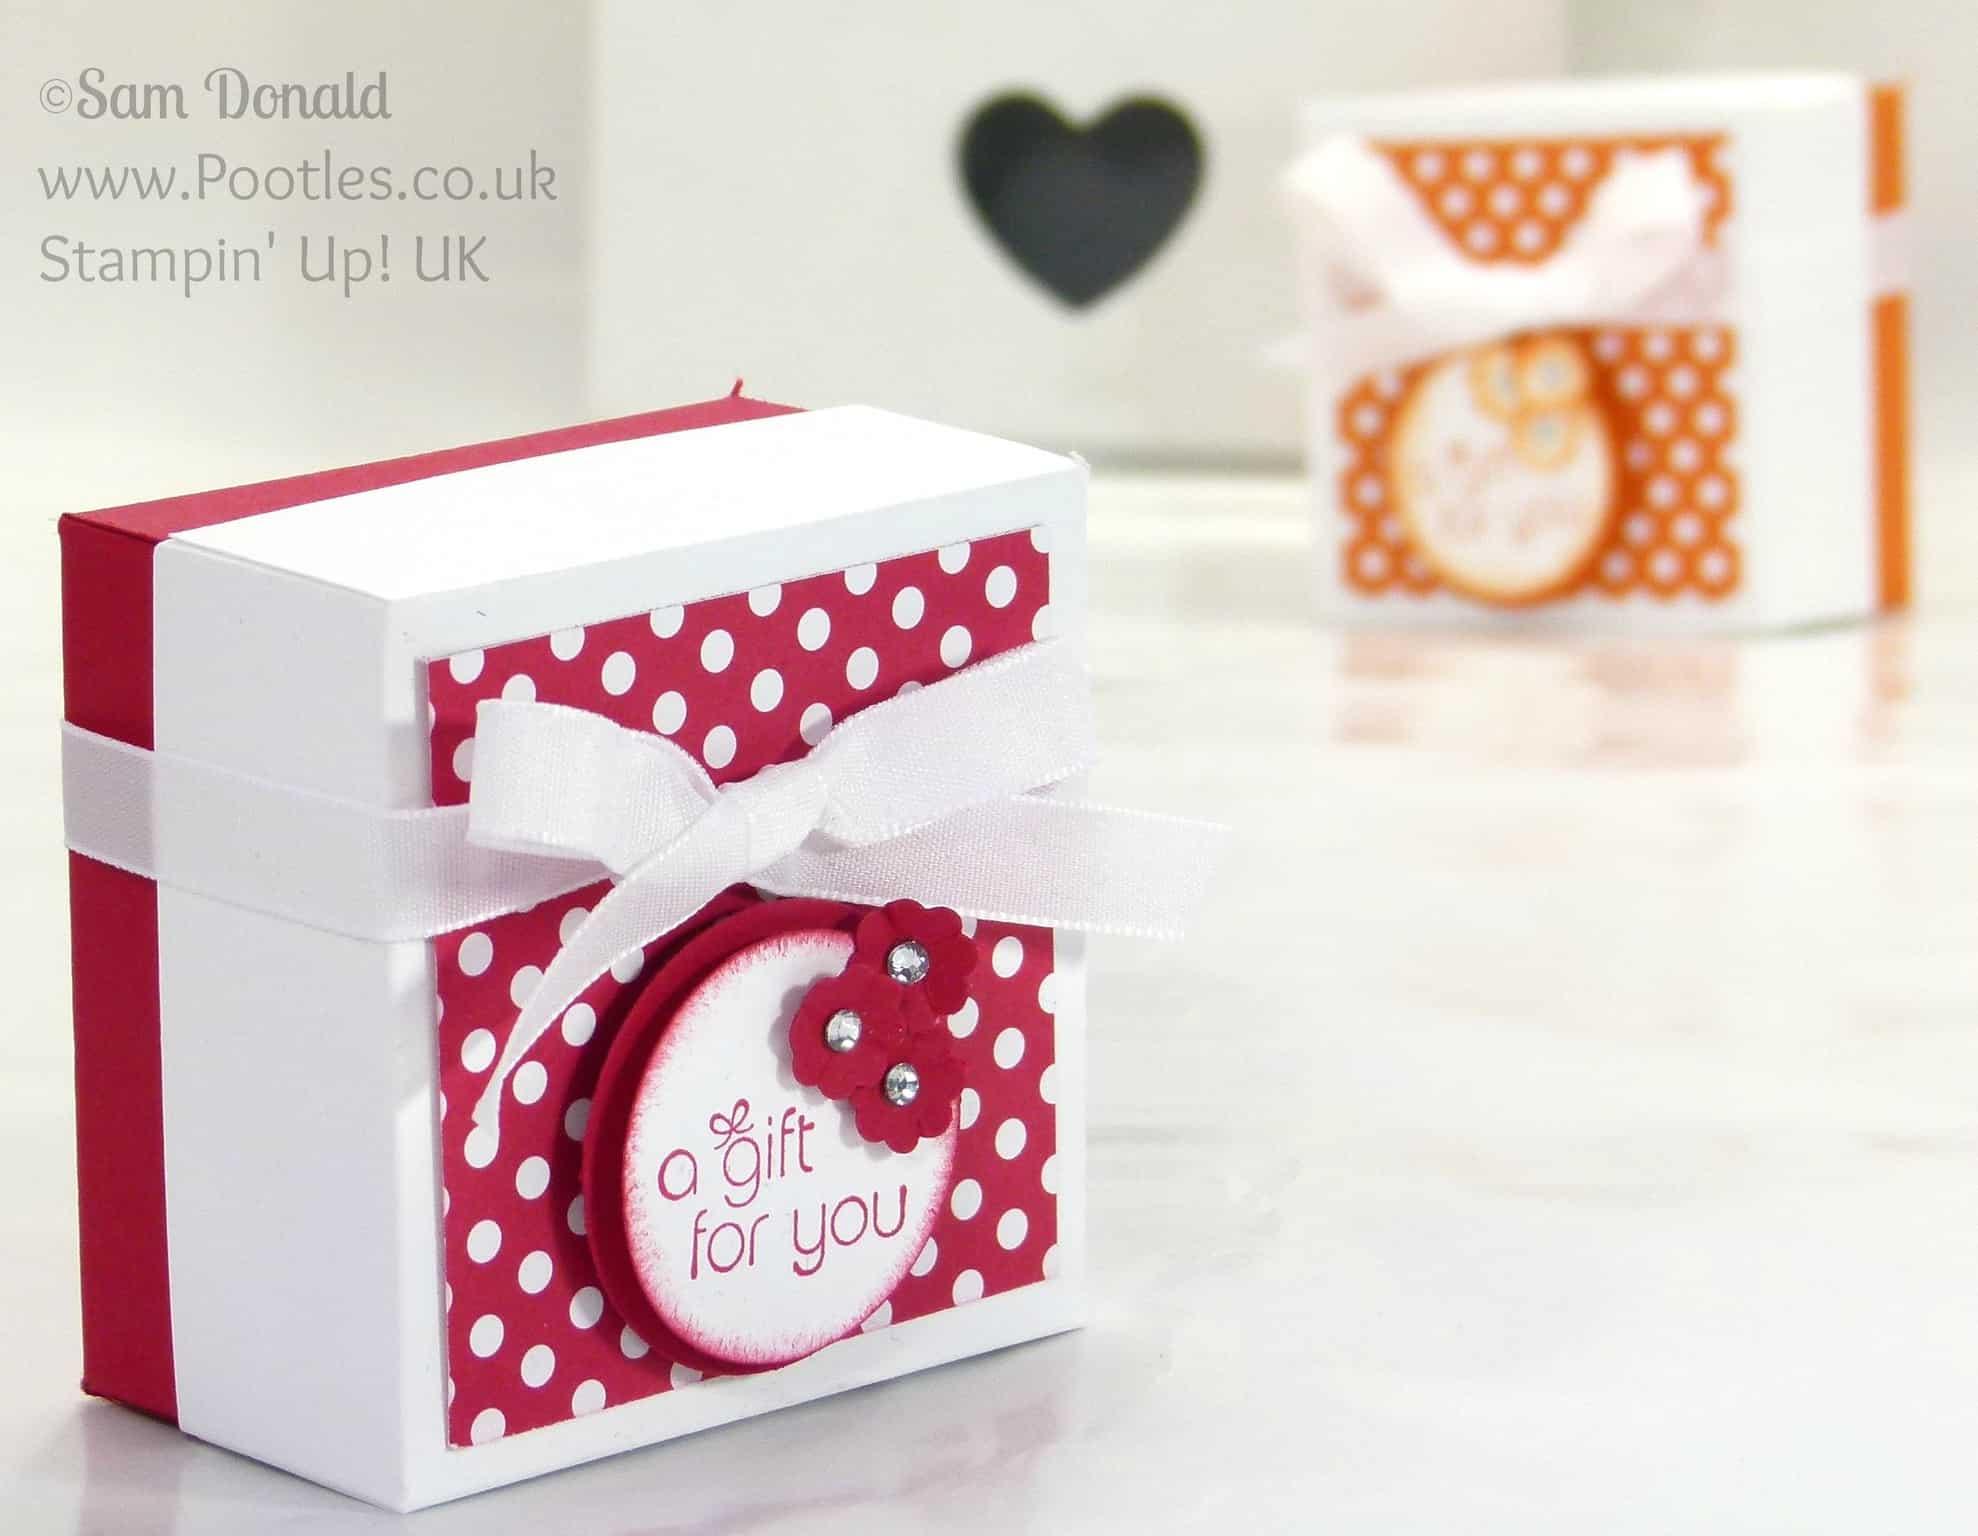 POOTLES Stampin' Up! UK The Spotty Box +Bonus Customer Gift